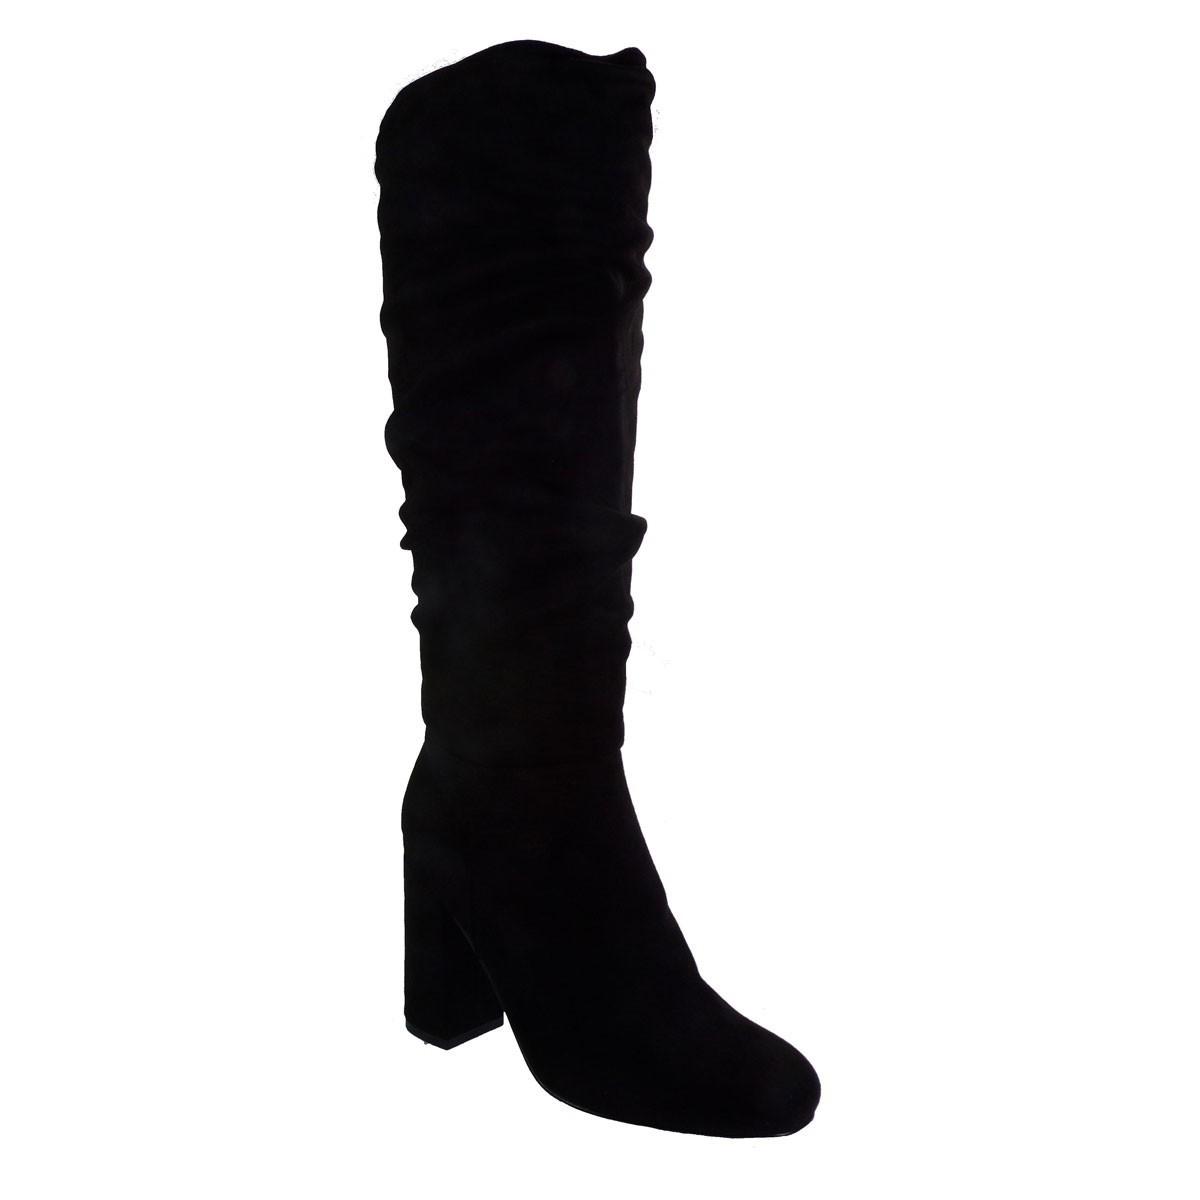 Exe Shoes Γυναικεία Παπούτσια Μπότα CARINA-596 Μαύρo Καστόρι H27005965004